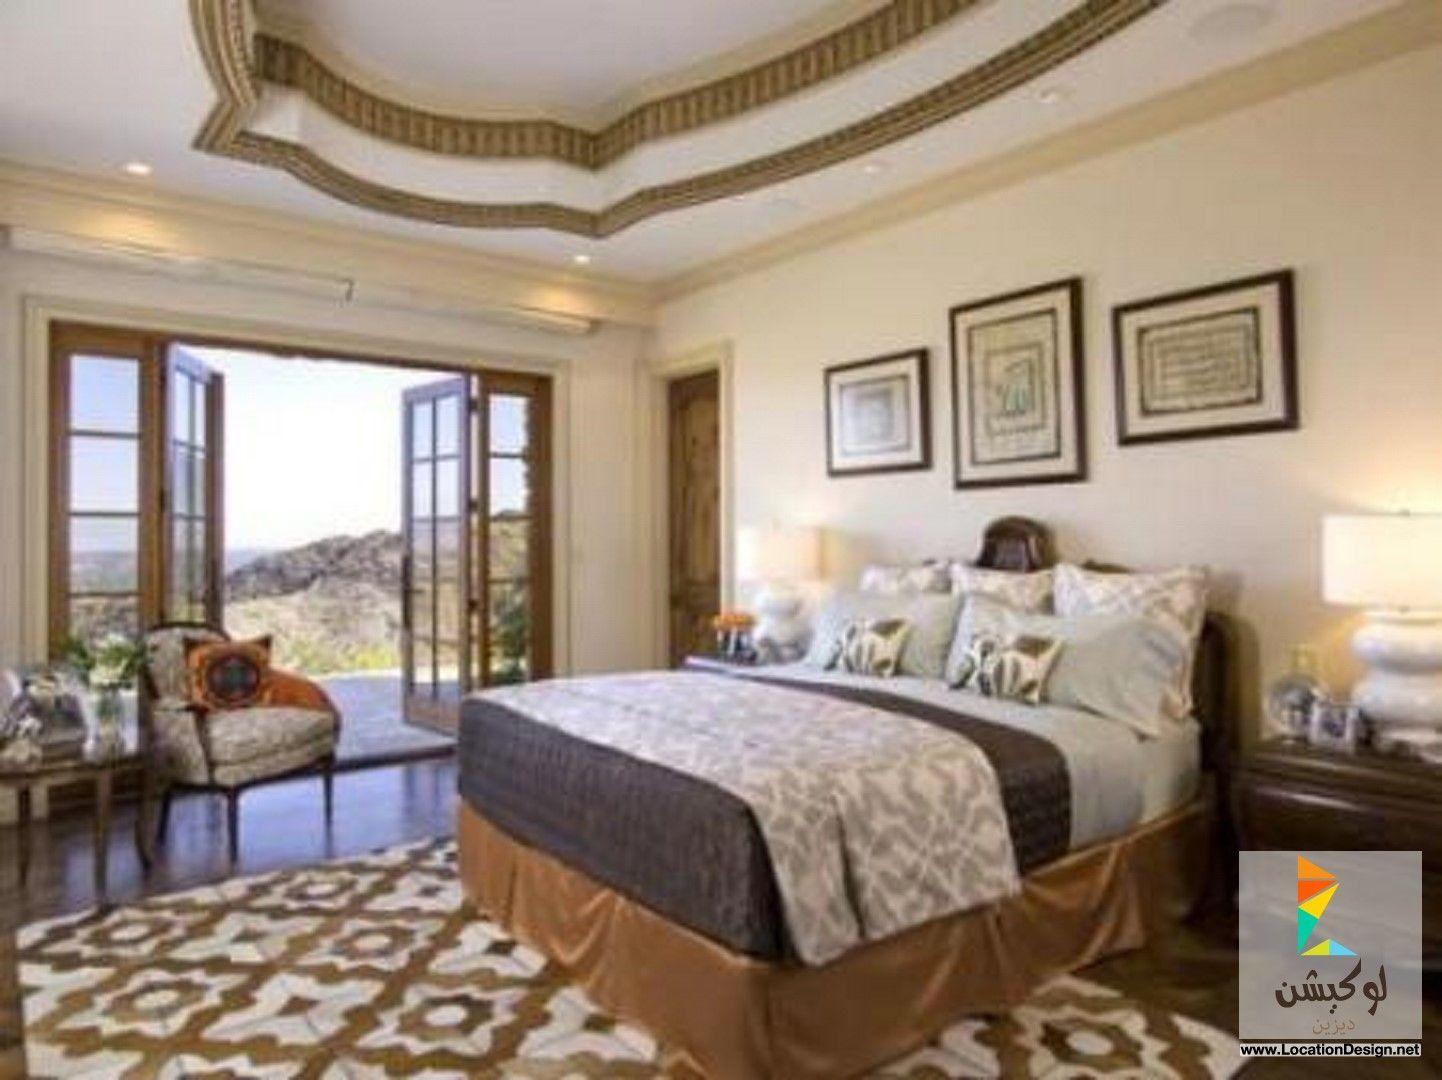 ديكور جبس غرف نوم للعرسان Home Decor Bedroom Apartment Bedroom Decor Bedroom Decor